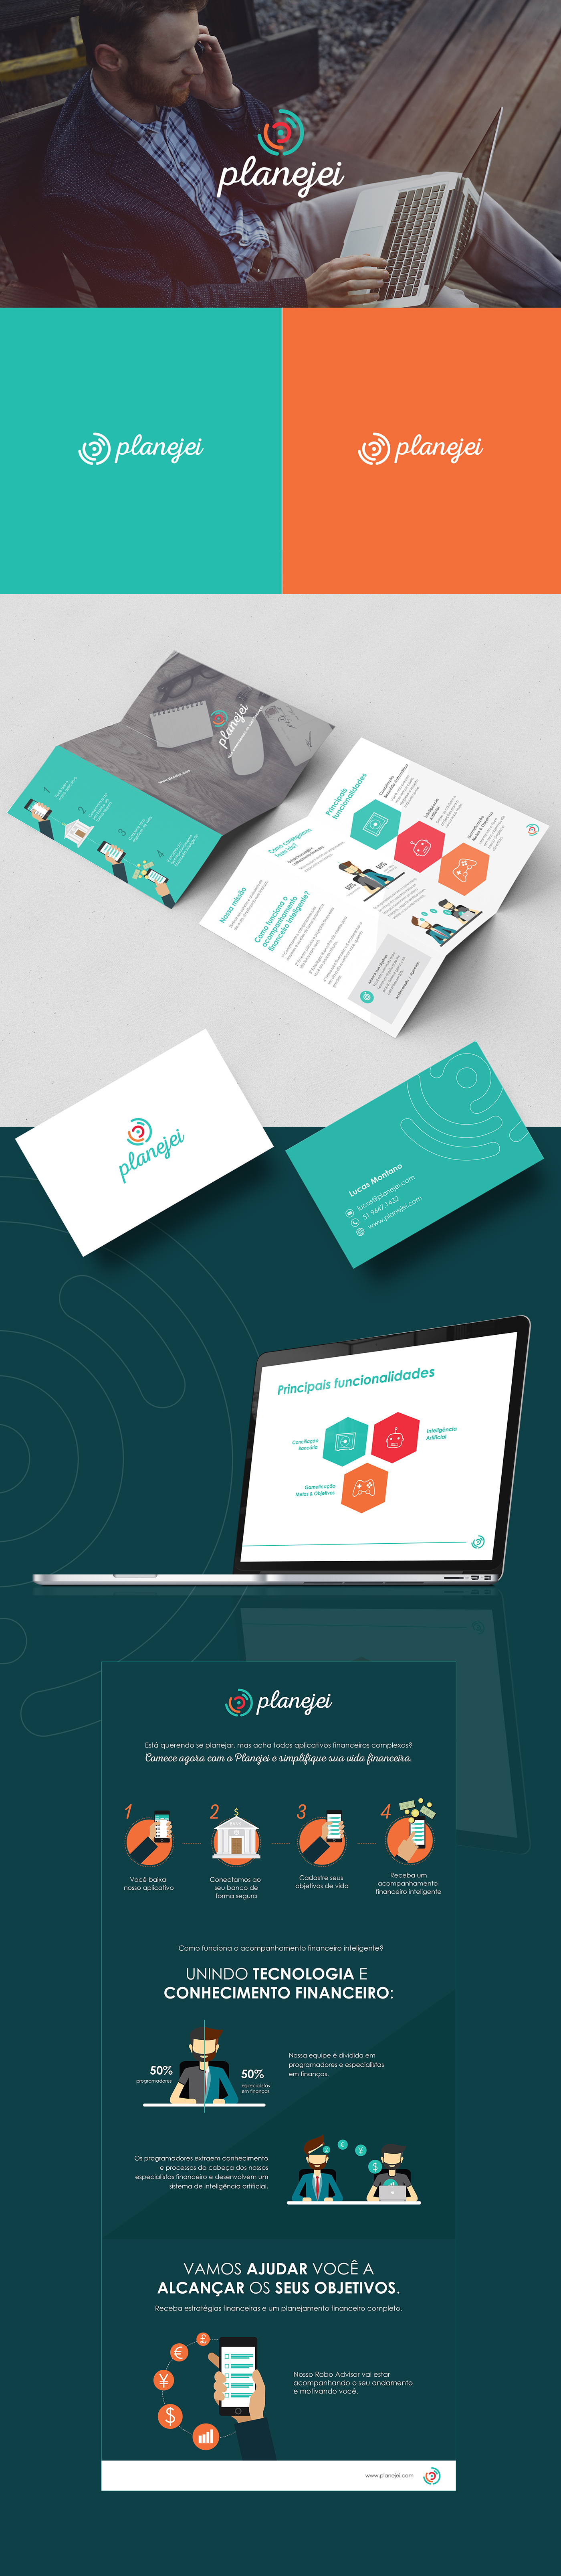 planejei aplicativo finanças app finances money organization Plan tecnology knowledge grafico chart maze Script system